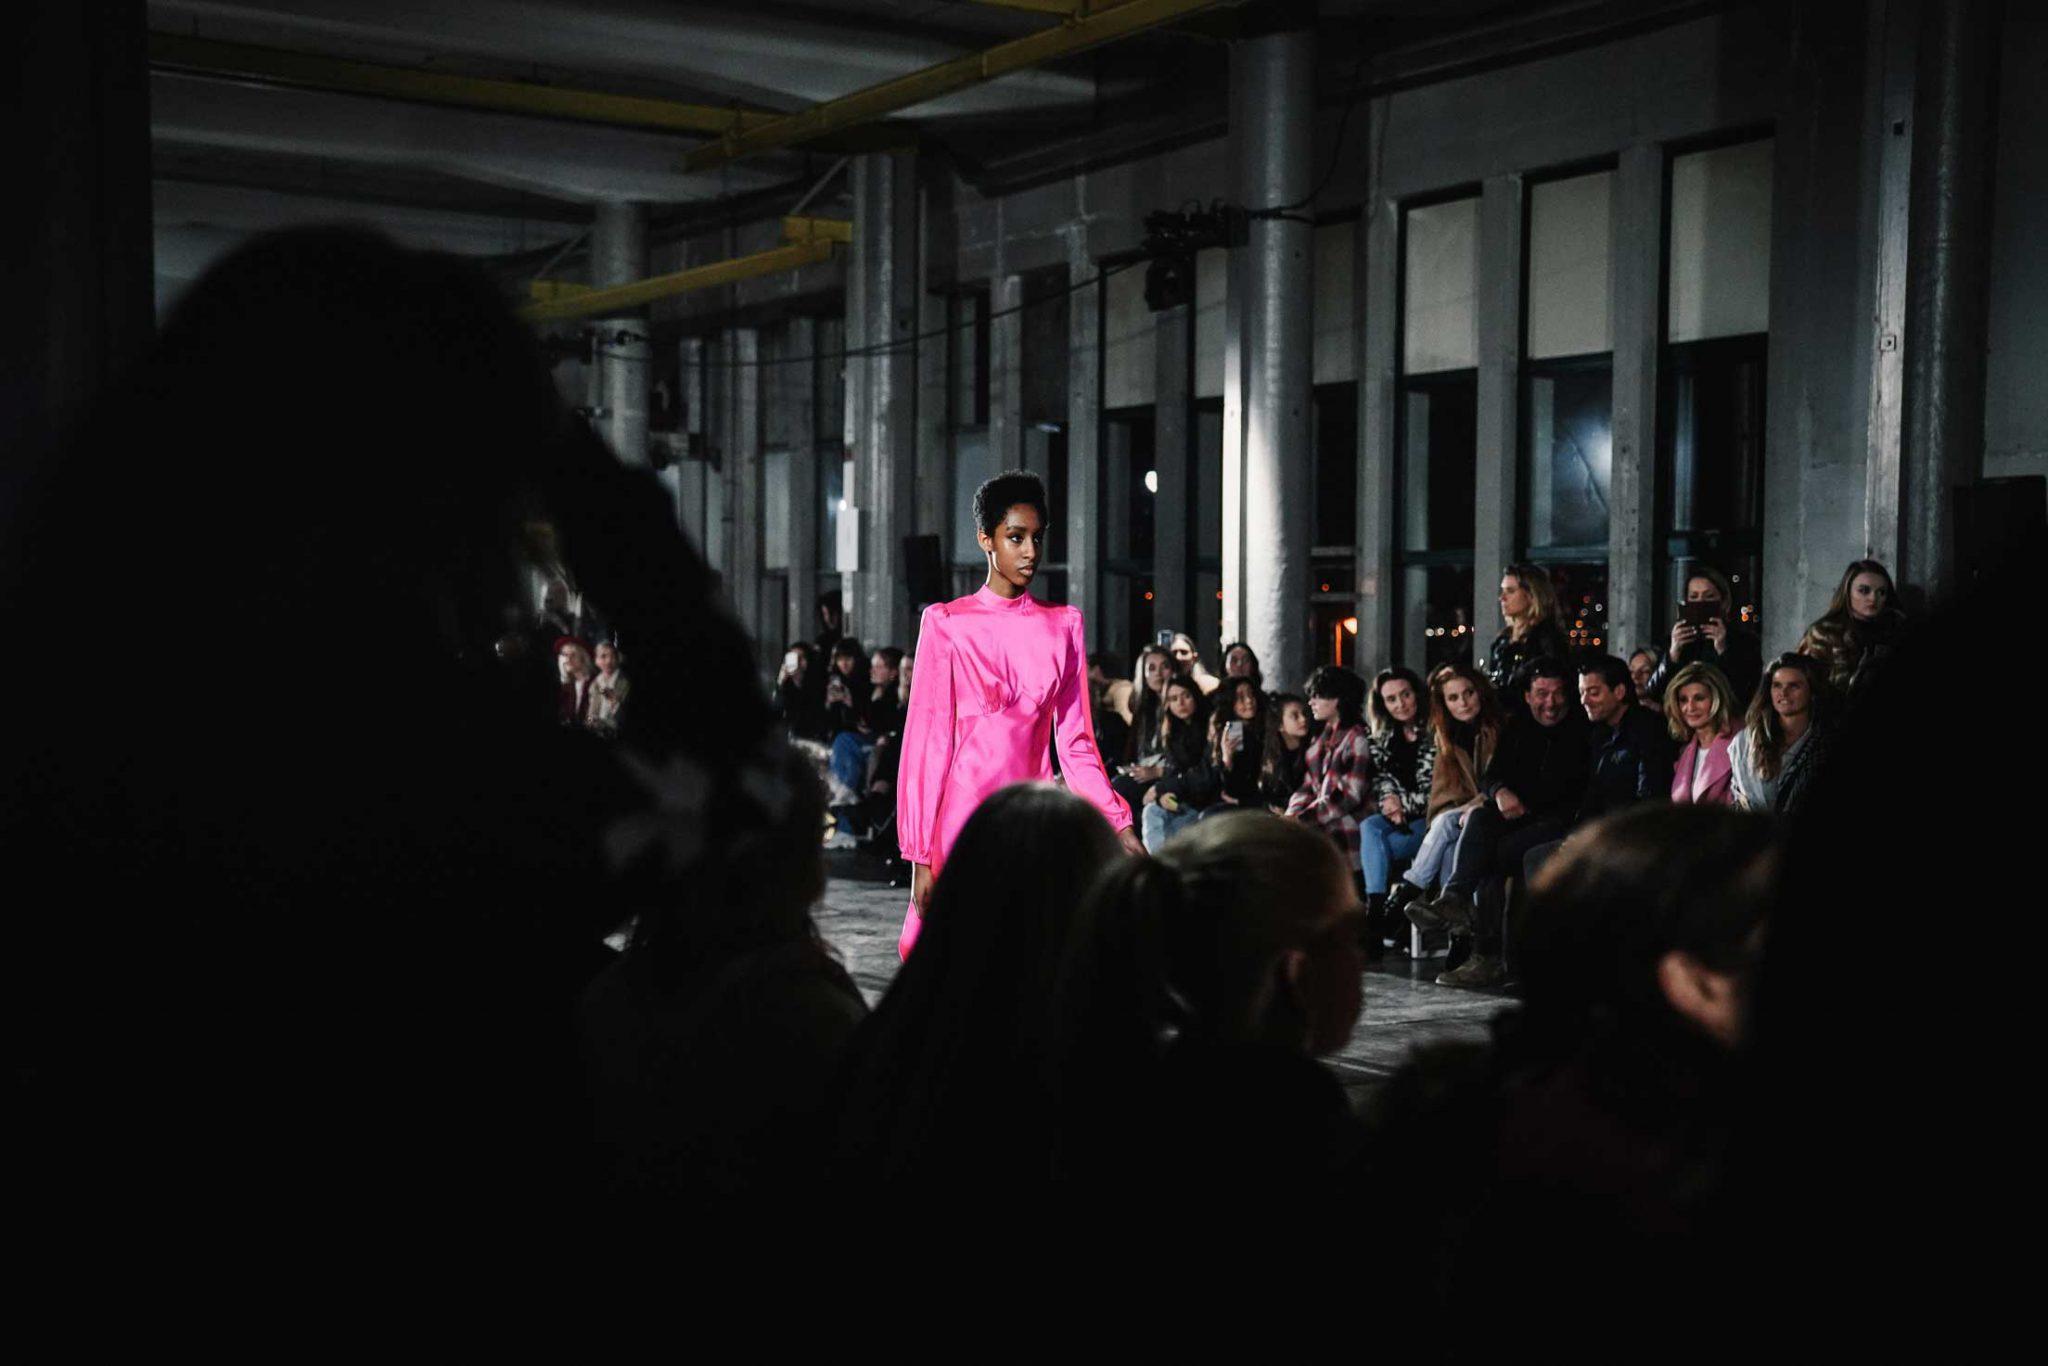 Ilsoo_van_Dijk_Ilsoovandijk_AFW_Toral_Backstage_Amsterdam_Fashion_week_2020_-scaled_19